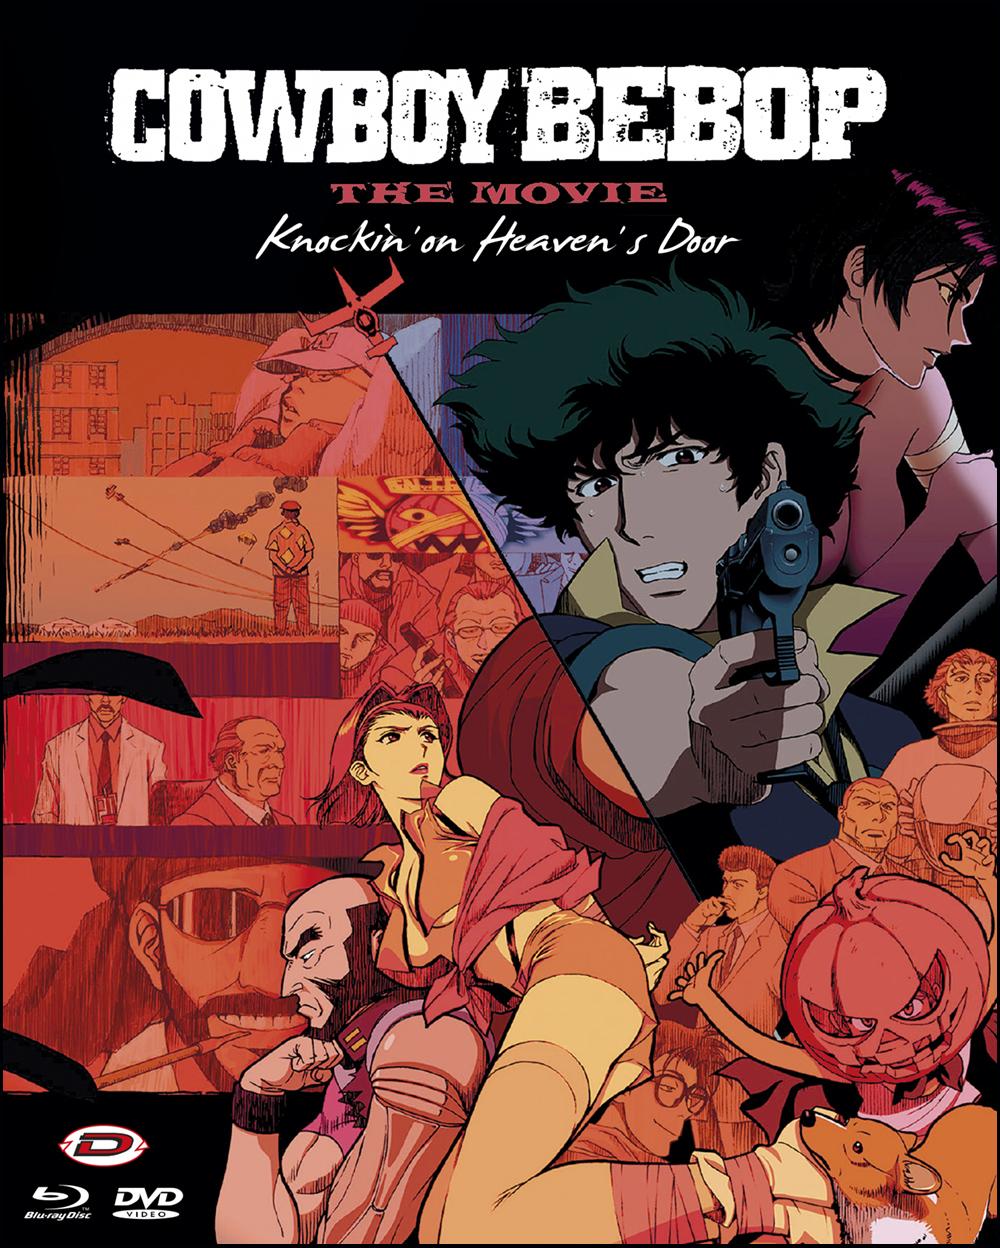 COF.COWBOY BEBOP - THE MOVIE - KNOCKIN' ON HEAVEN'S DOOR (BLU-RA